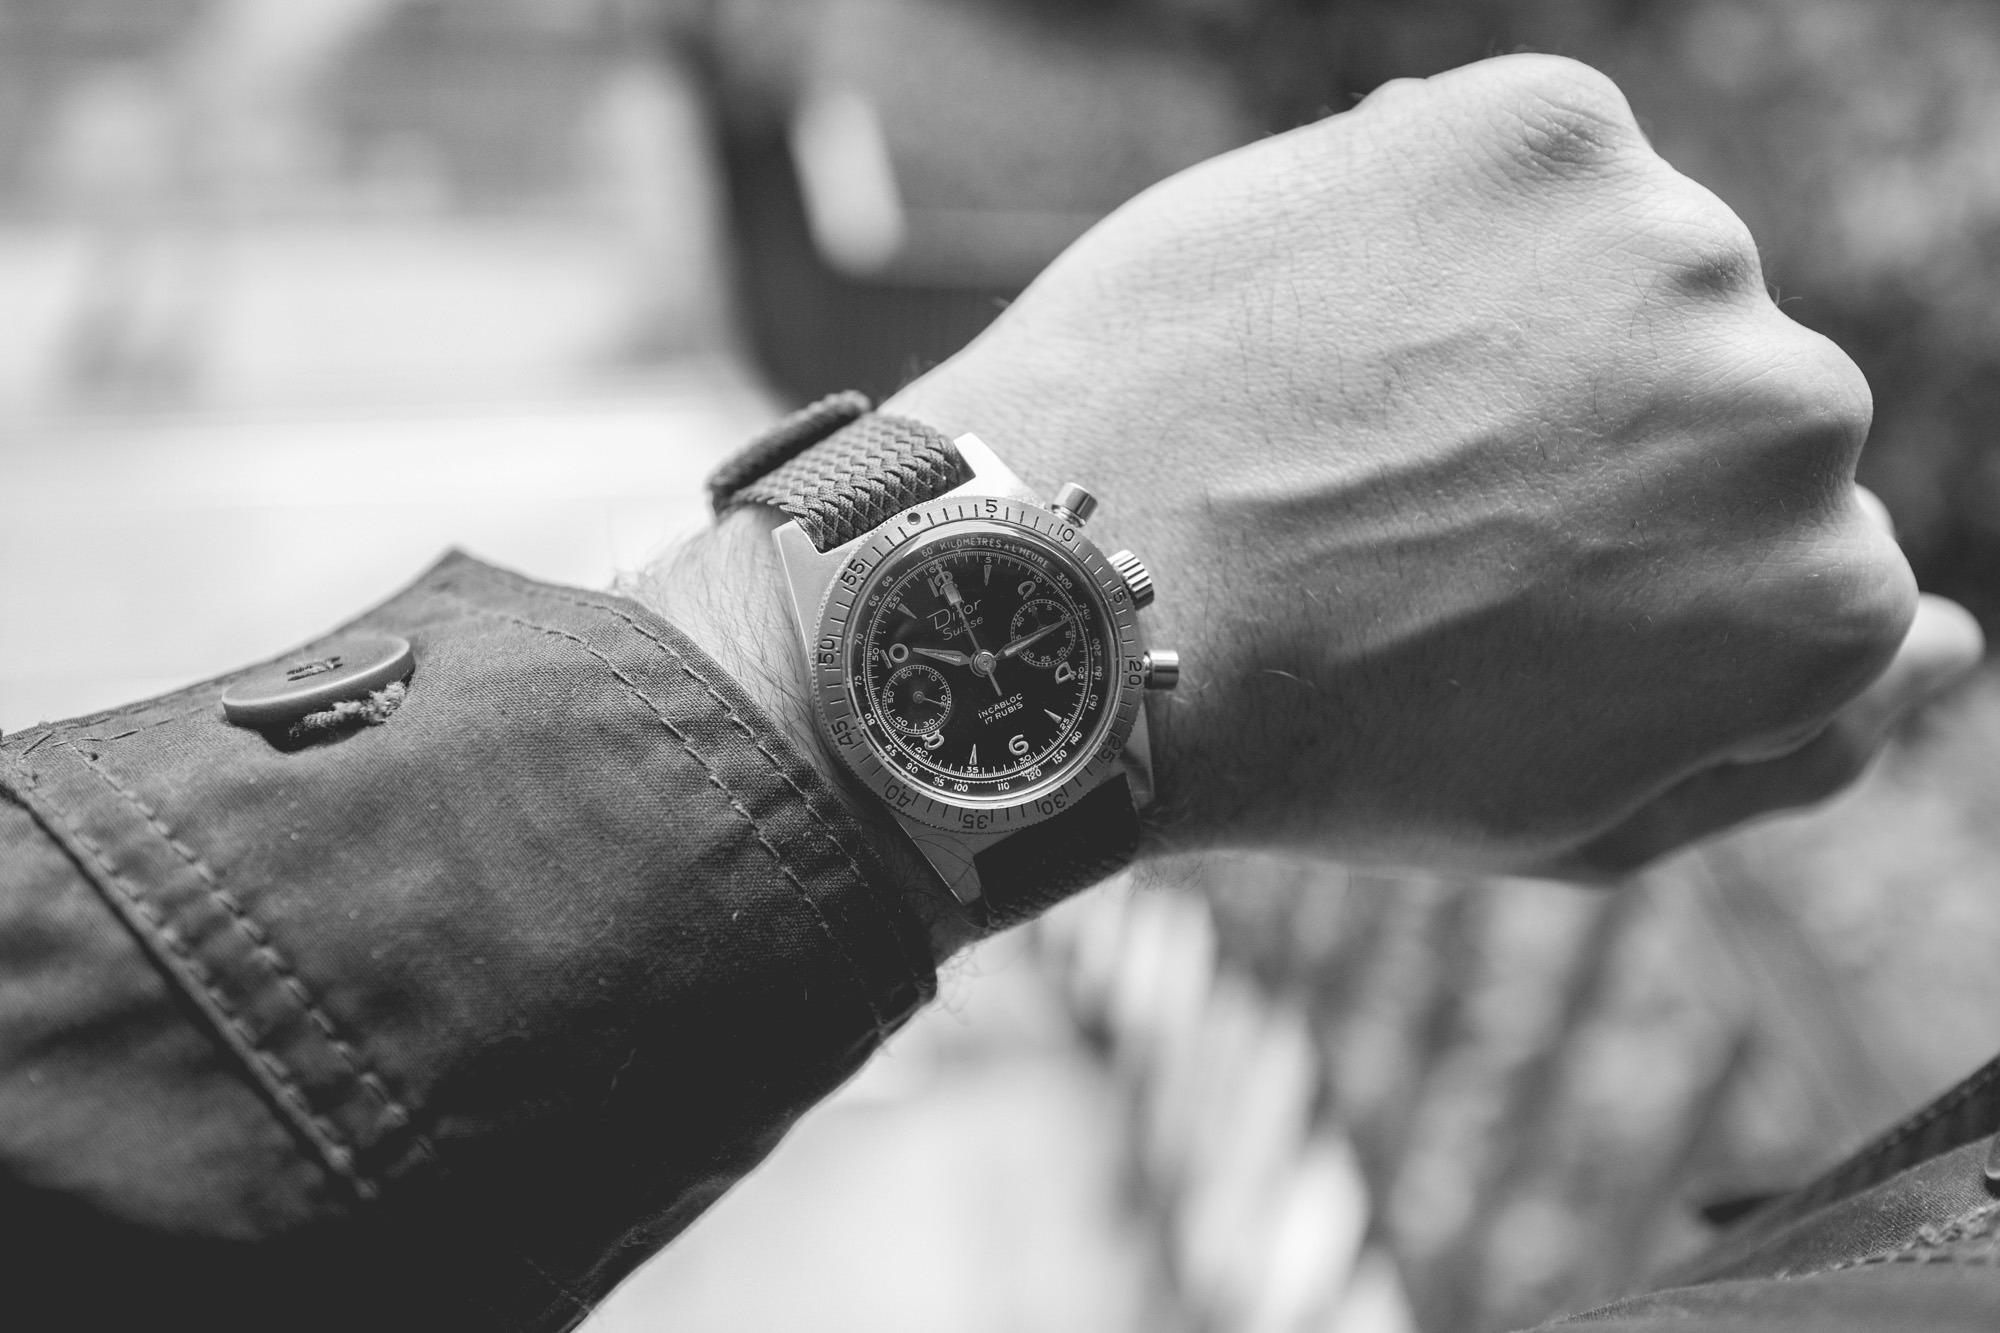 Difor Suisse - Chronographe Circa 1960's - Wrist